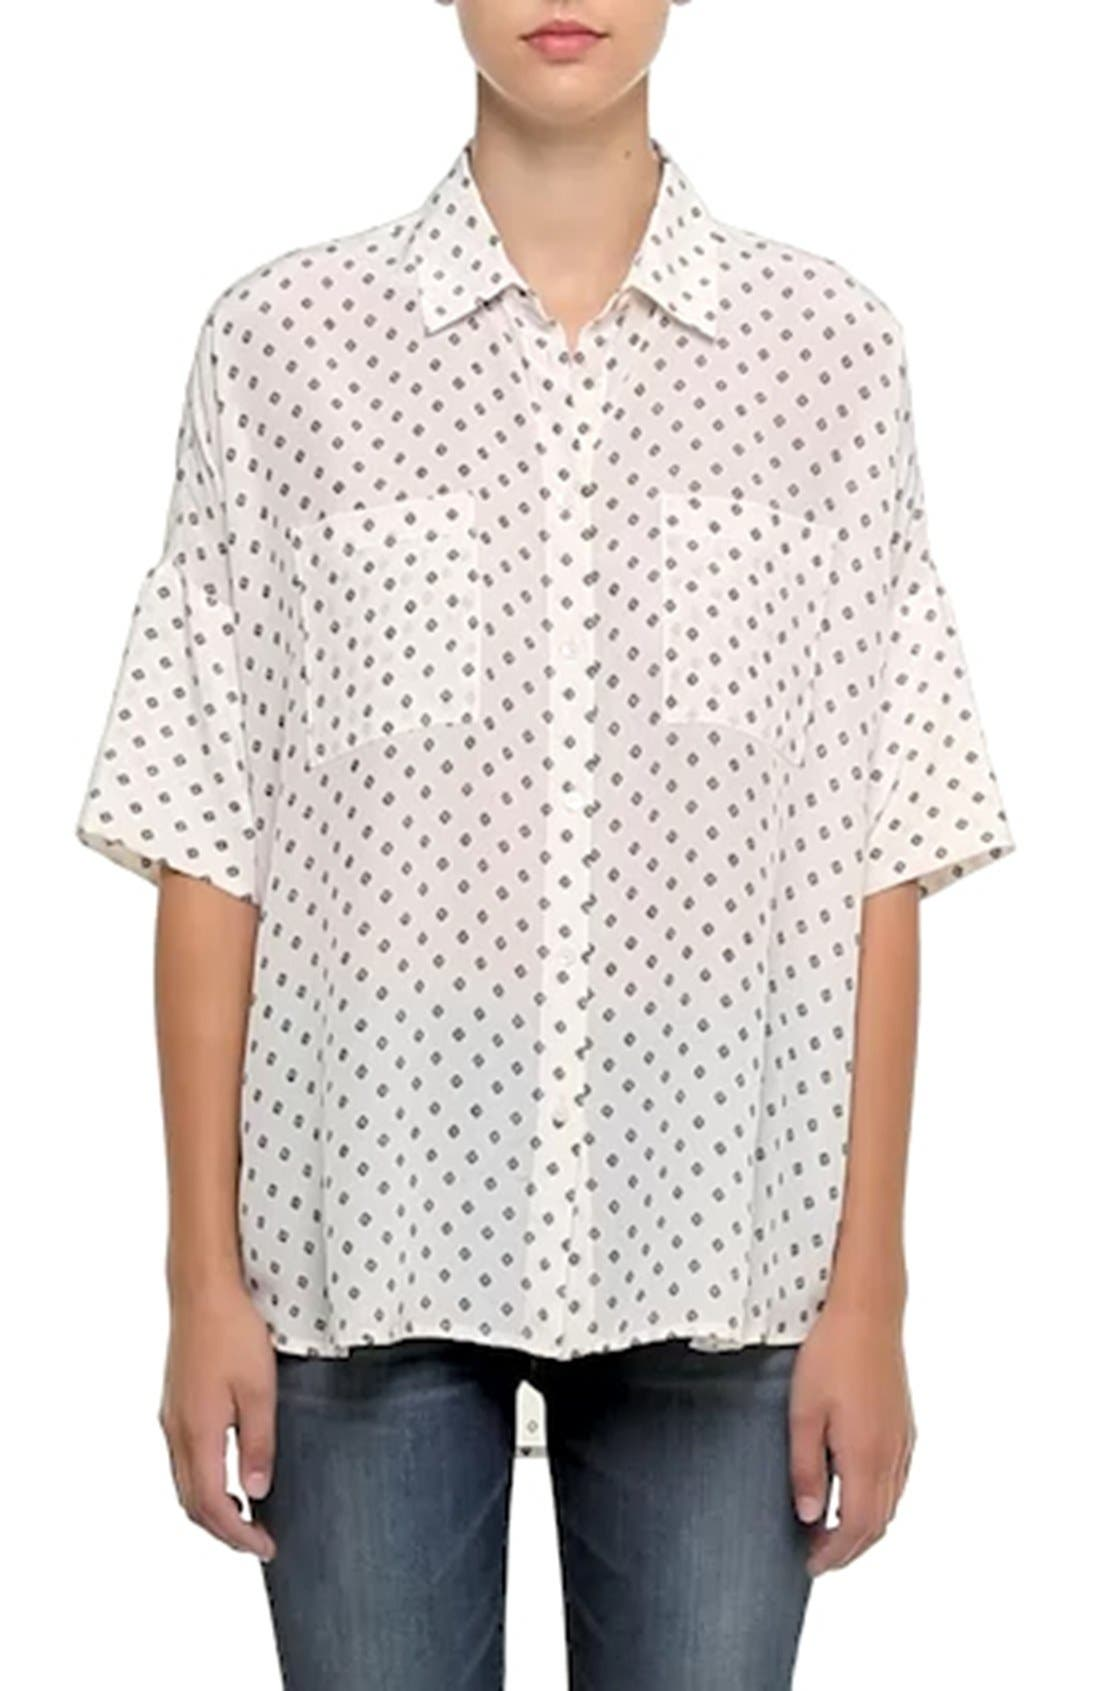 MADEWELL,                             'Foulard Dot' Silk Courier Shirt,                             Alternate thumbnail 2, color,                             900